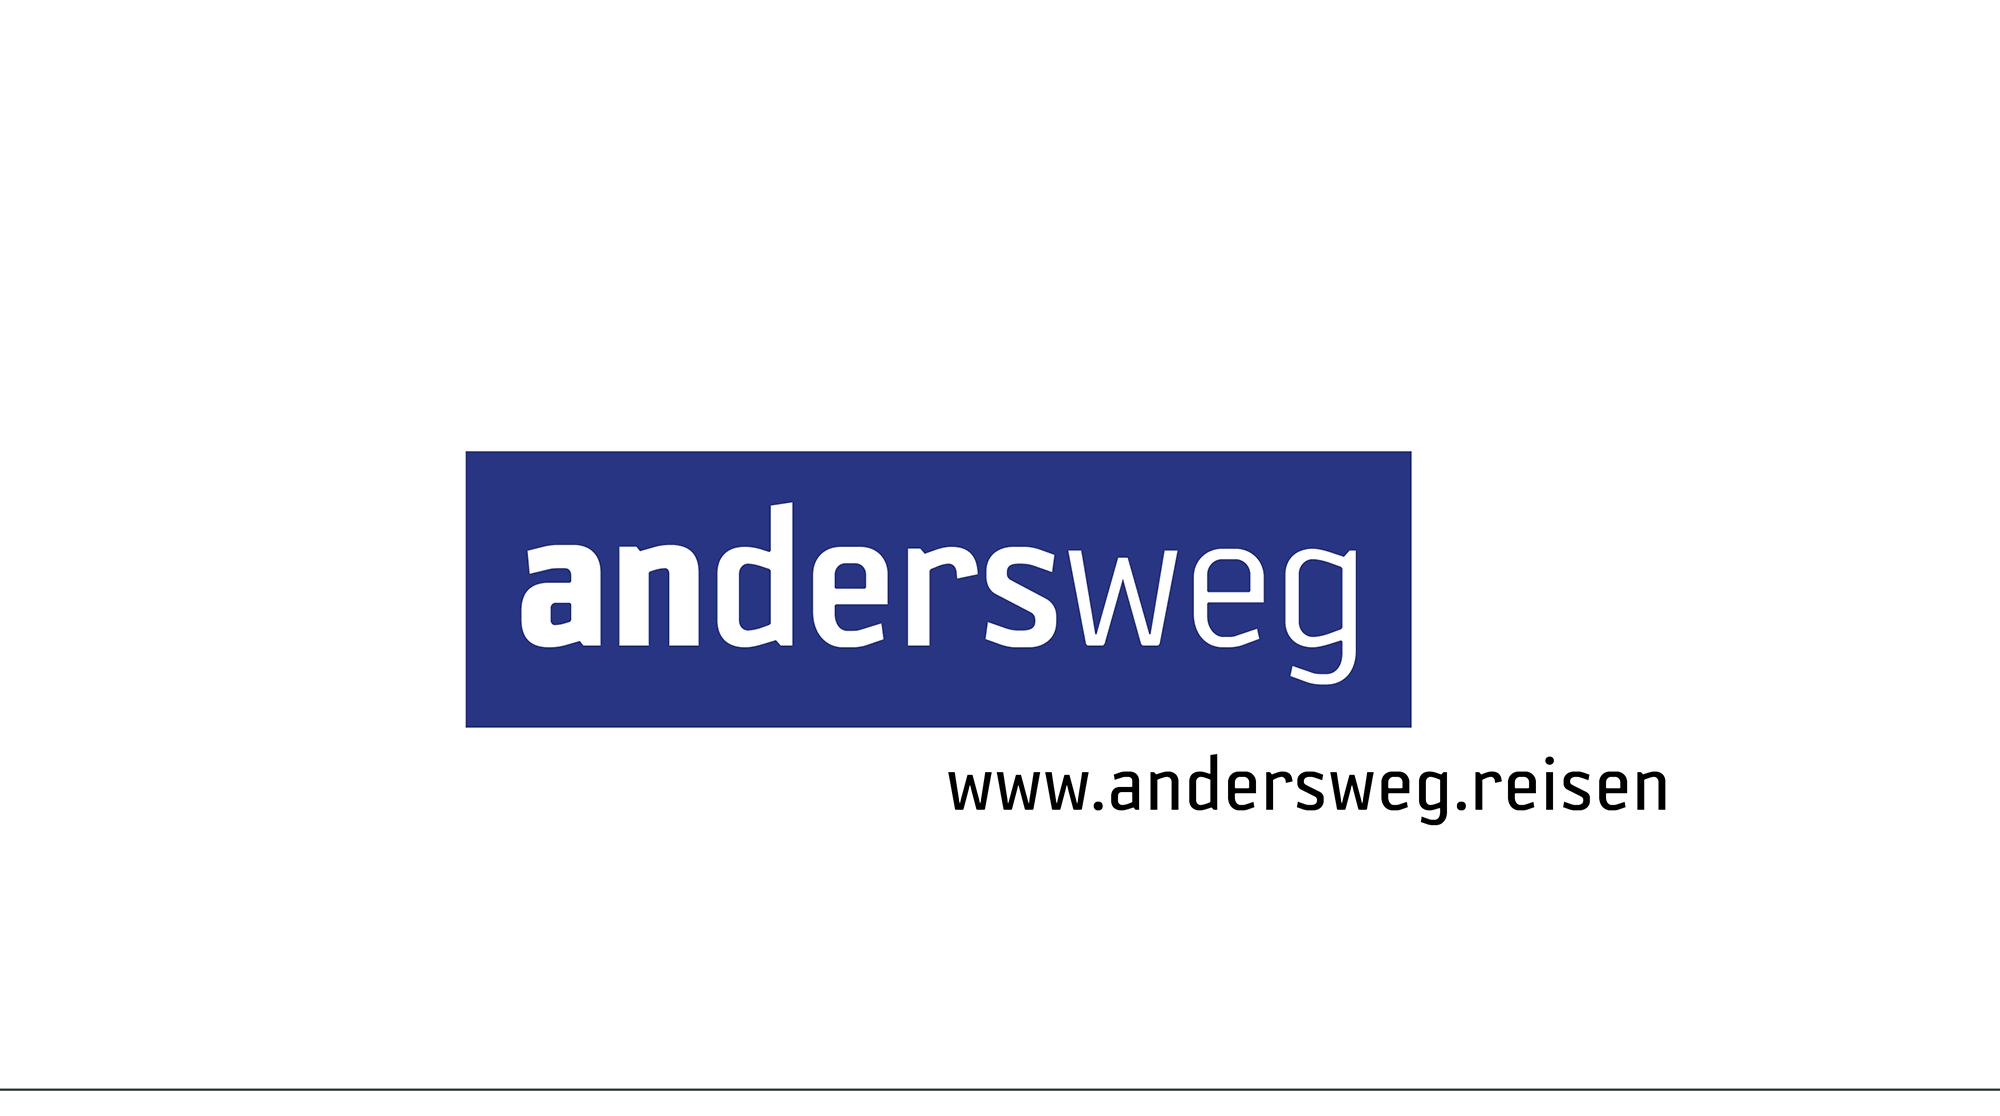 Logos_andersweg